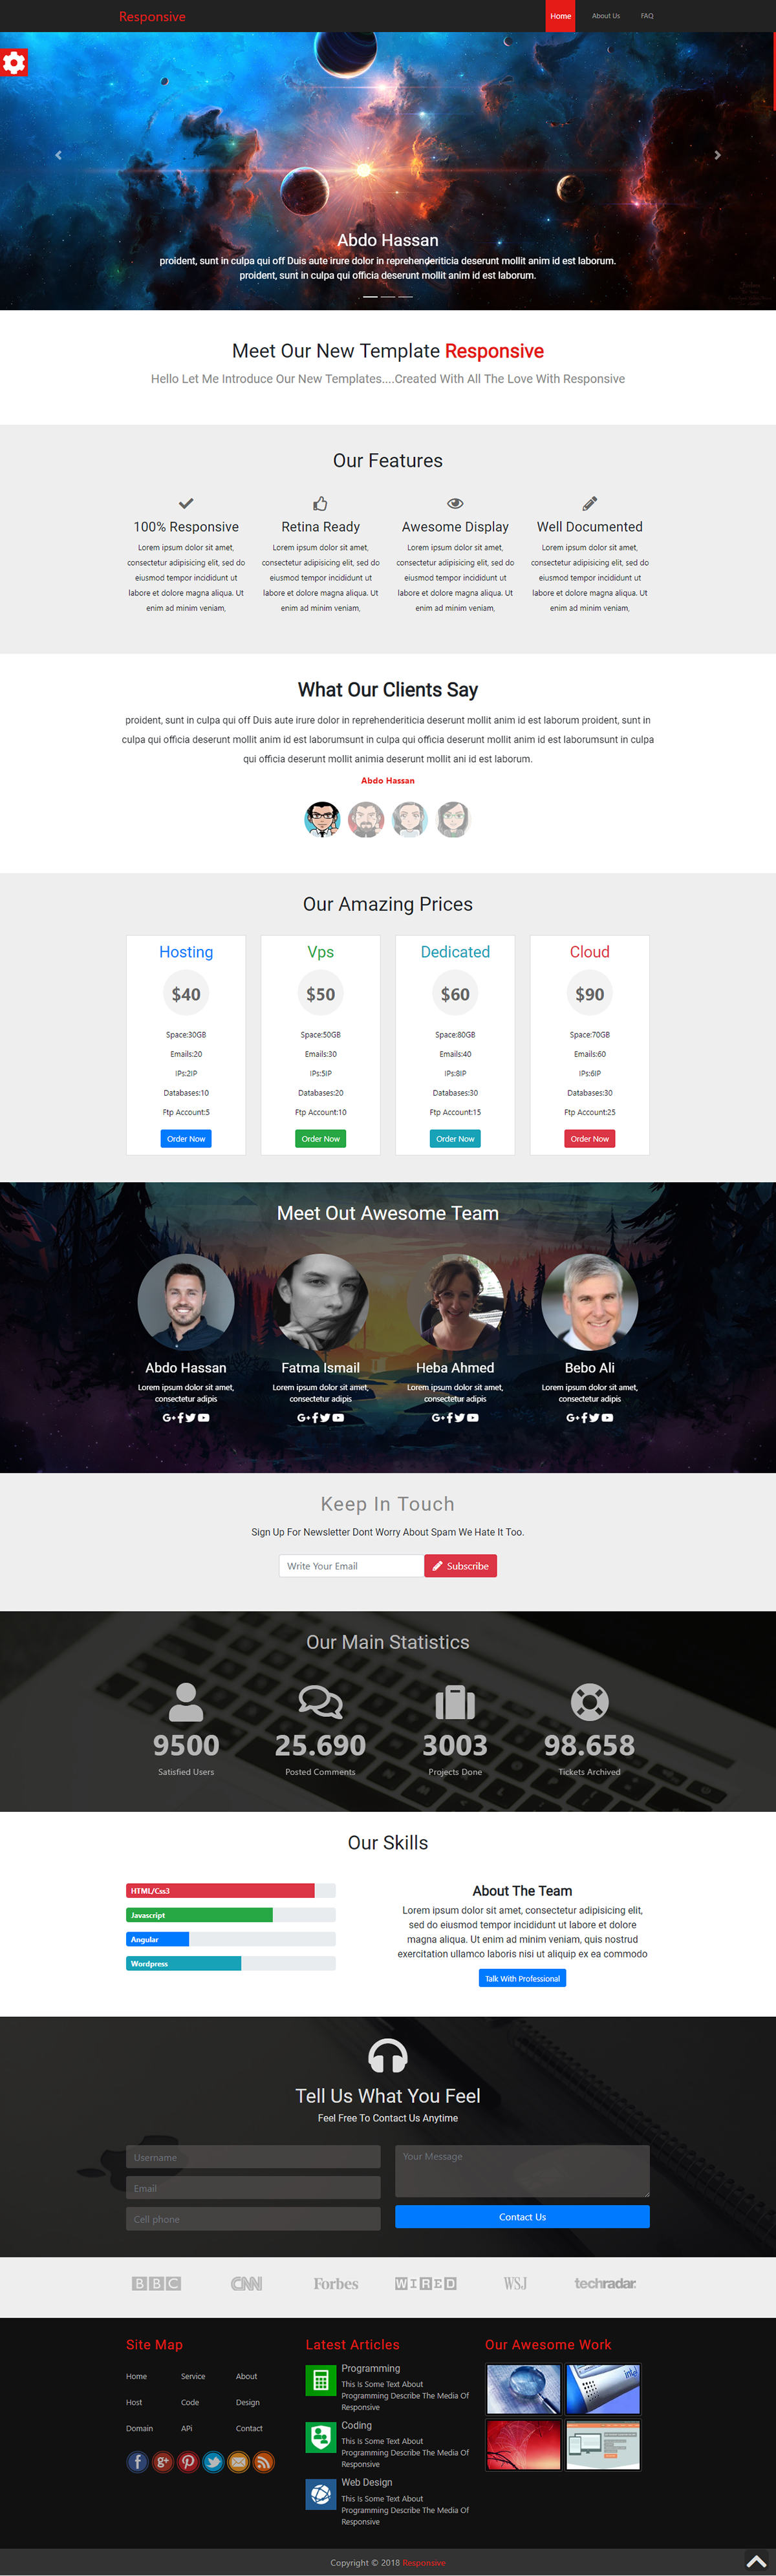 HTML css bootstrap JavaScript UI design Web